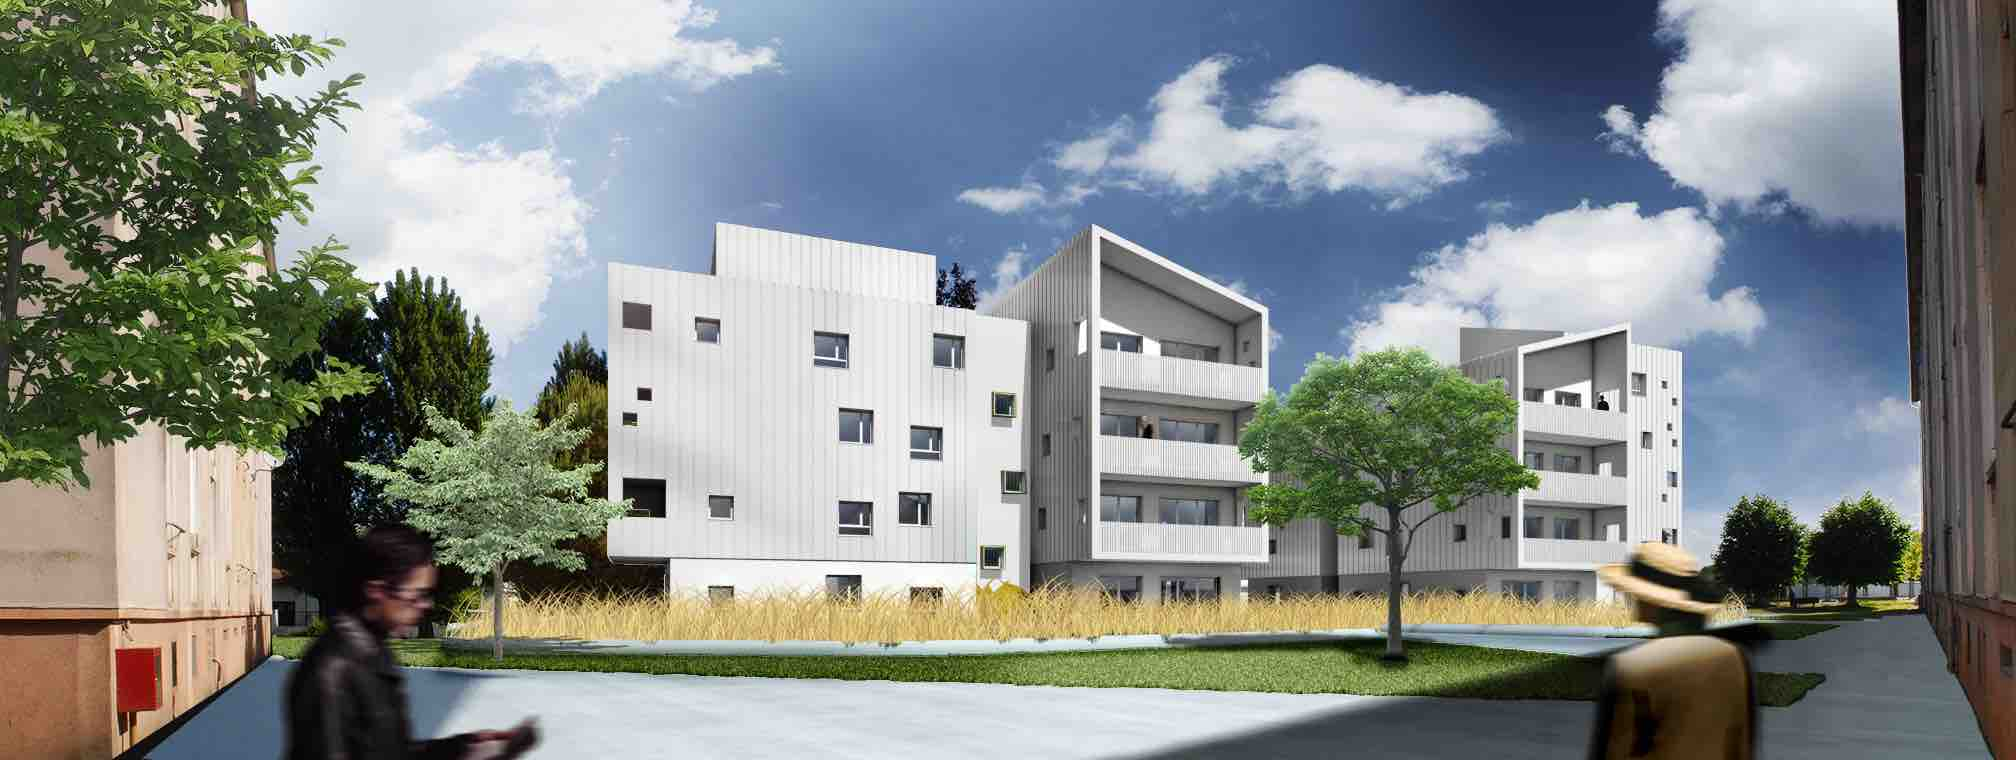 etude thermique logement collectif f&h ingenierie begles